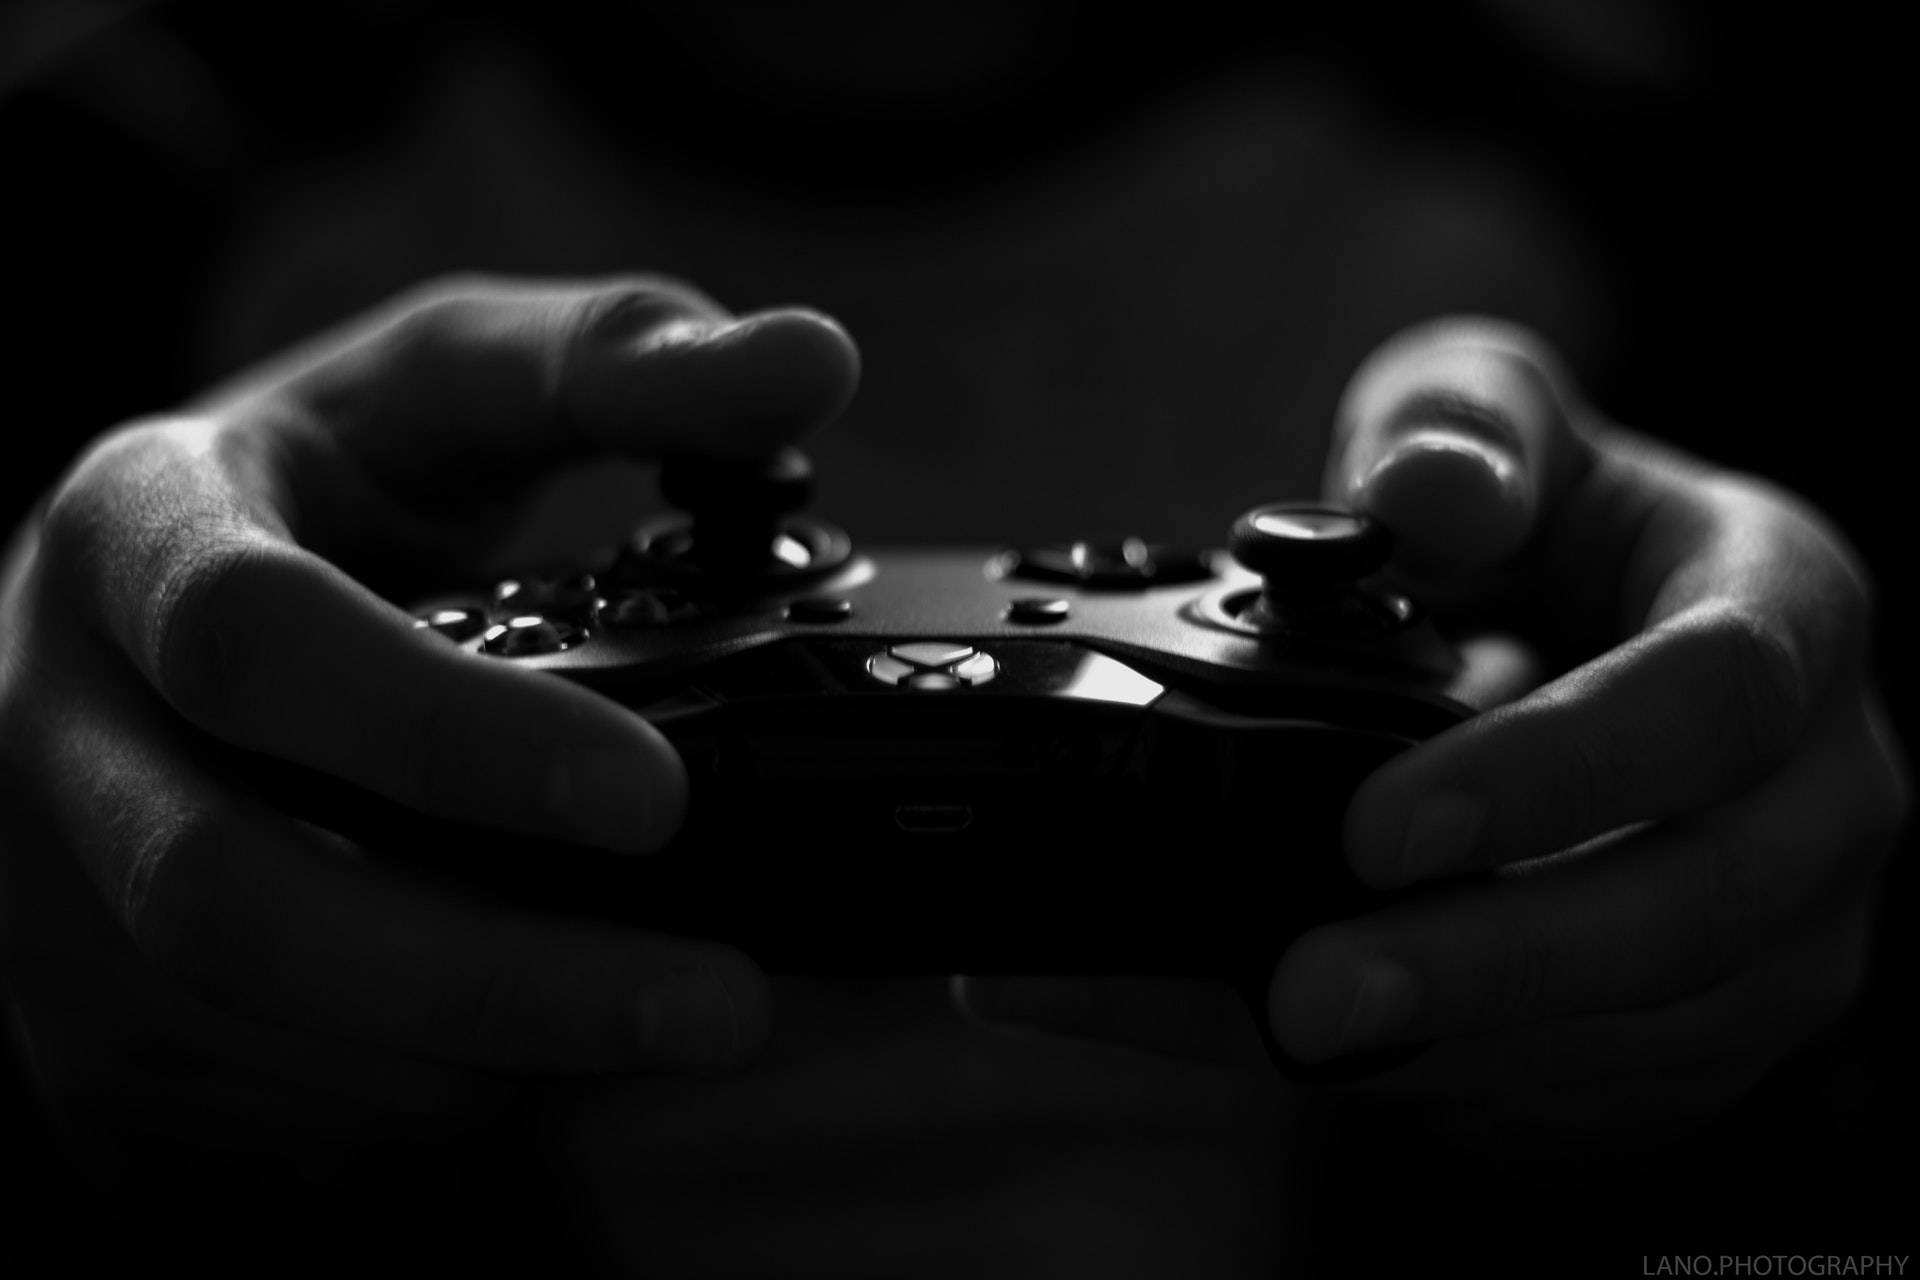 Lootbox-Verbot: Dilemma um EA und 0,91 € pro Stunde